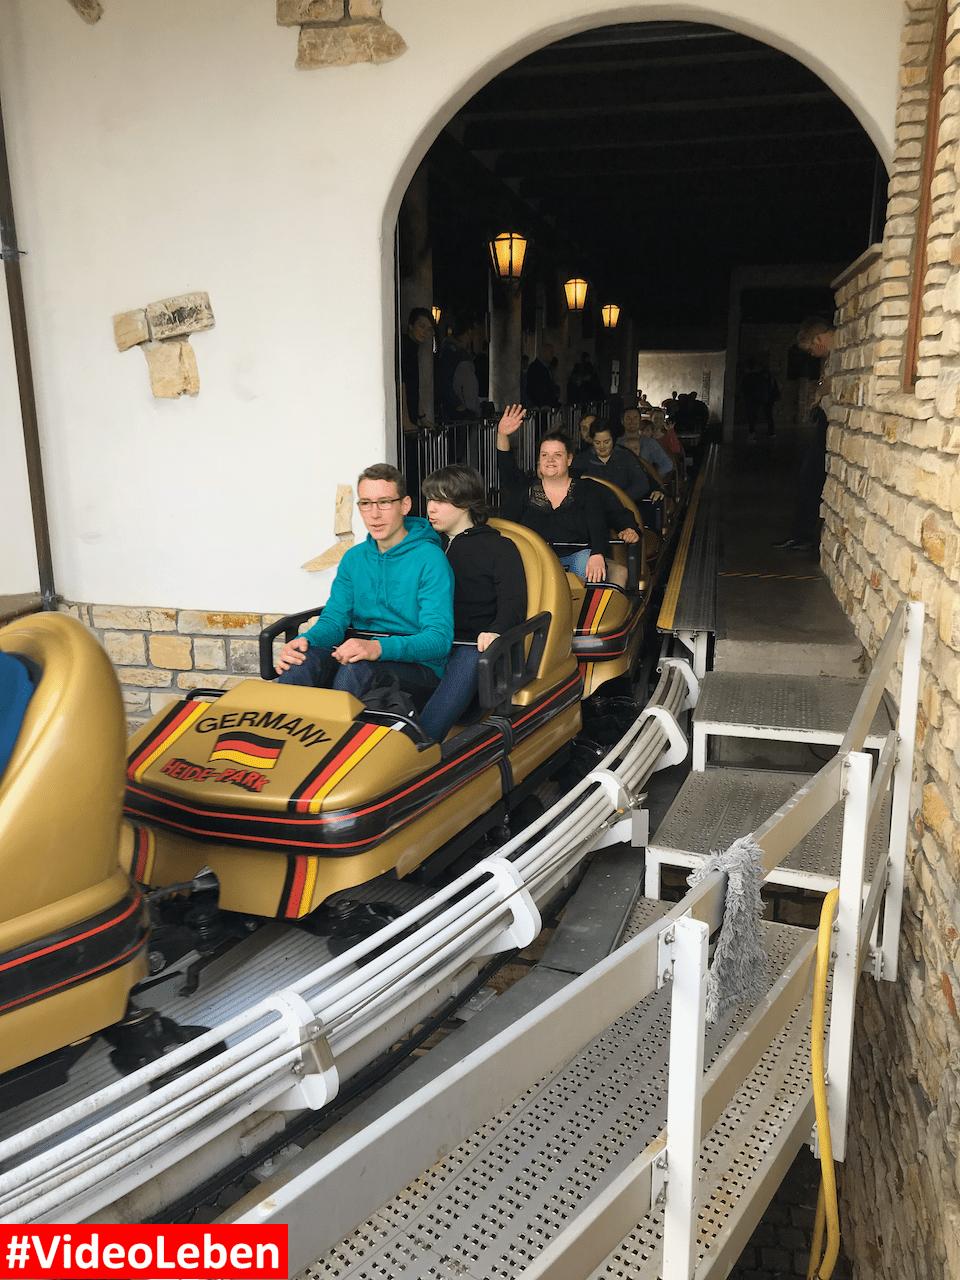 Bobbahn - Heide-Park Resort Soltau #Videoleben